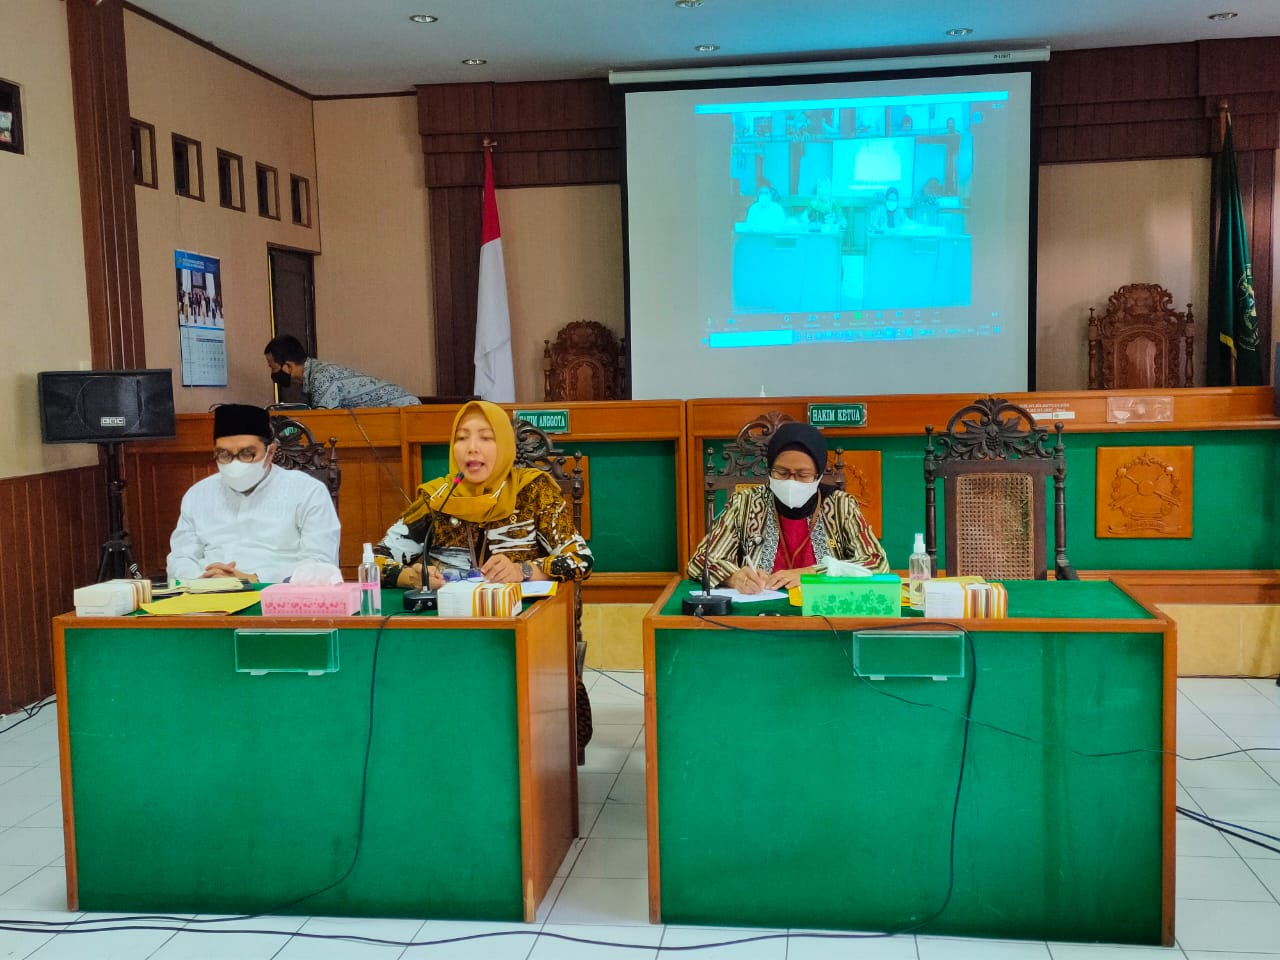 Rapat Bulanan Pengadilan Negeri Surakarta Kelas IA Khusus Periode Agustus 2021